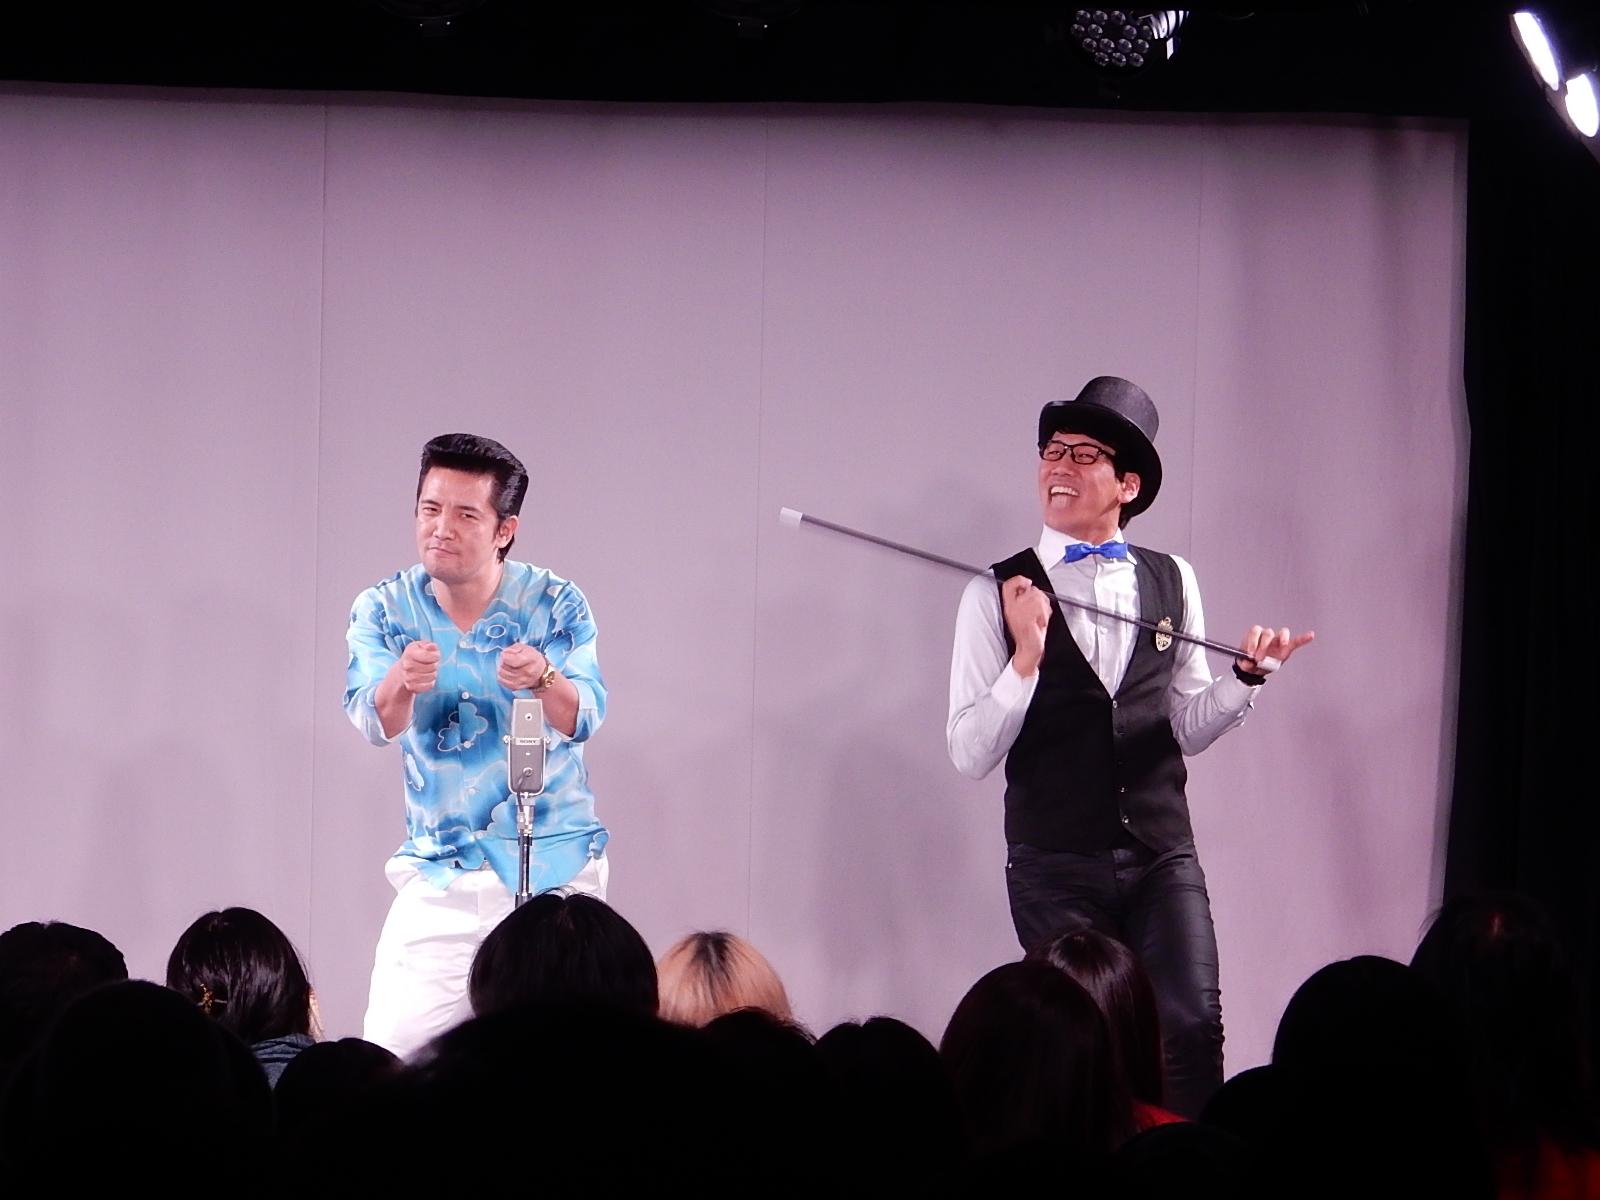 http://news.yoshimoto.co.jp/photos/uncategorized/2014/12/30/20141230150106-cc97c4c530a26d661c6083f493185b006ff80884.jpg